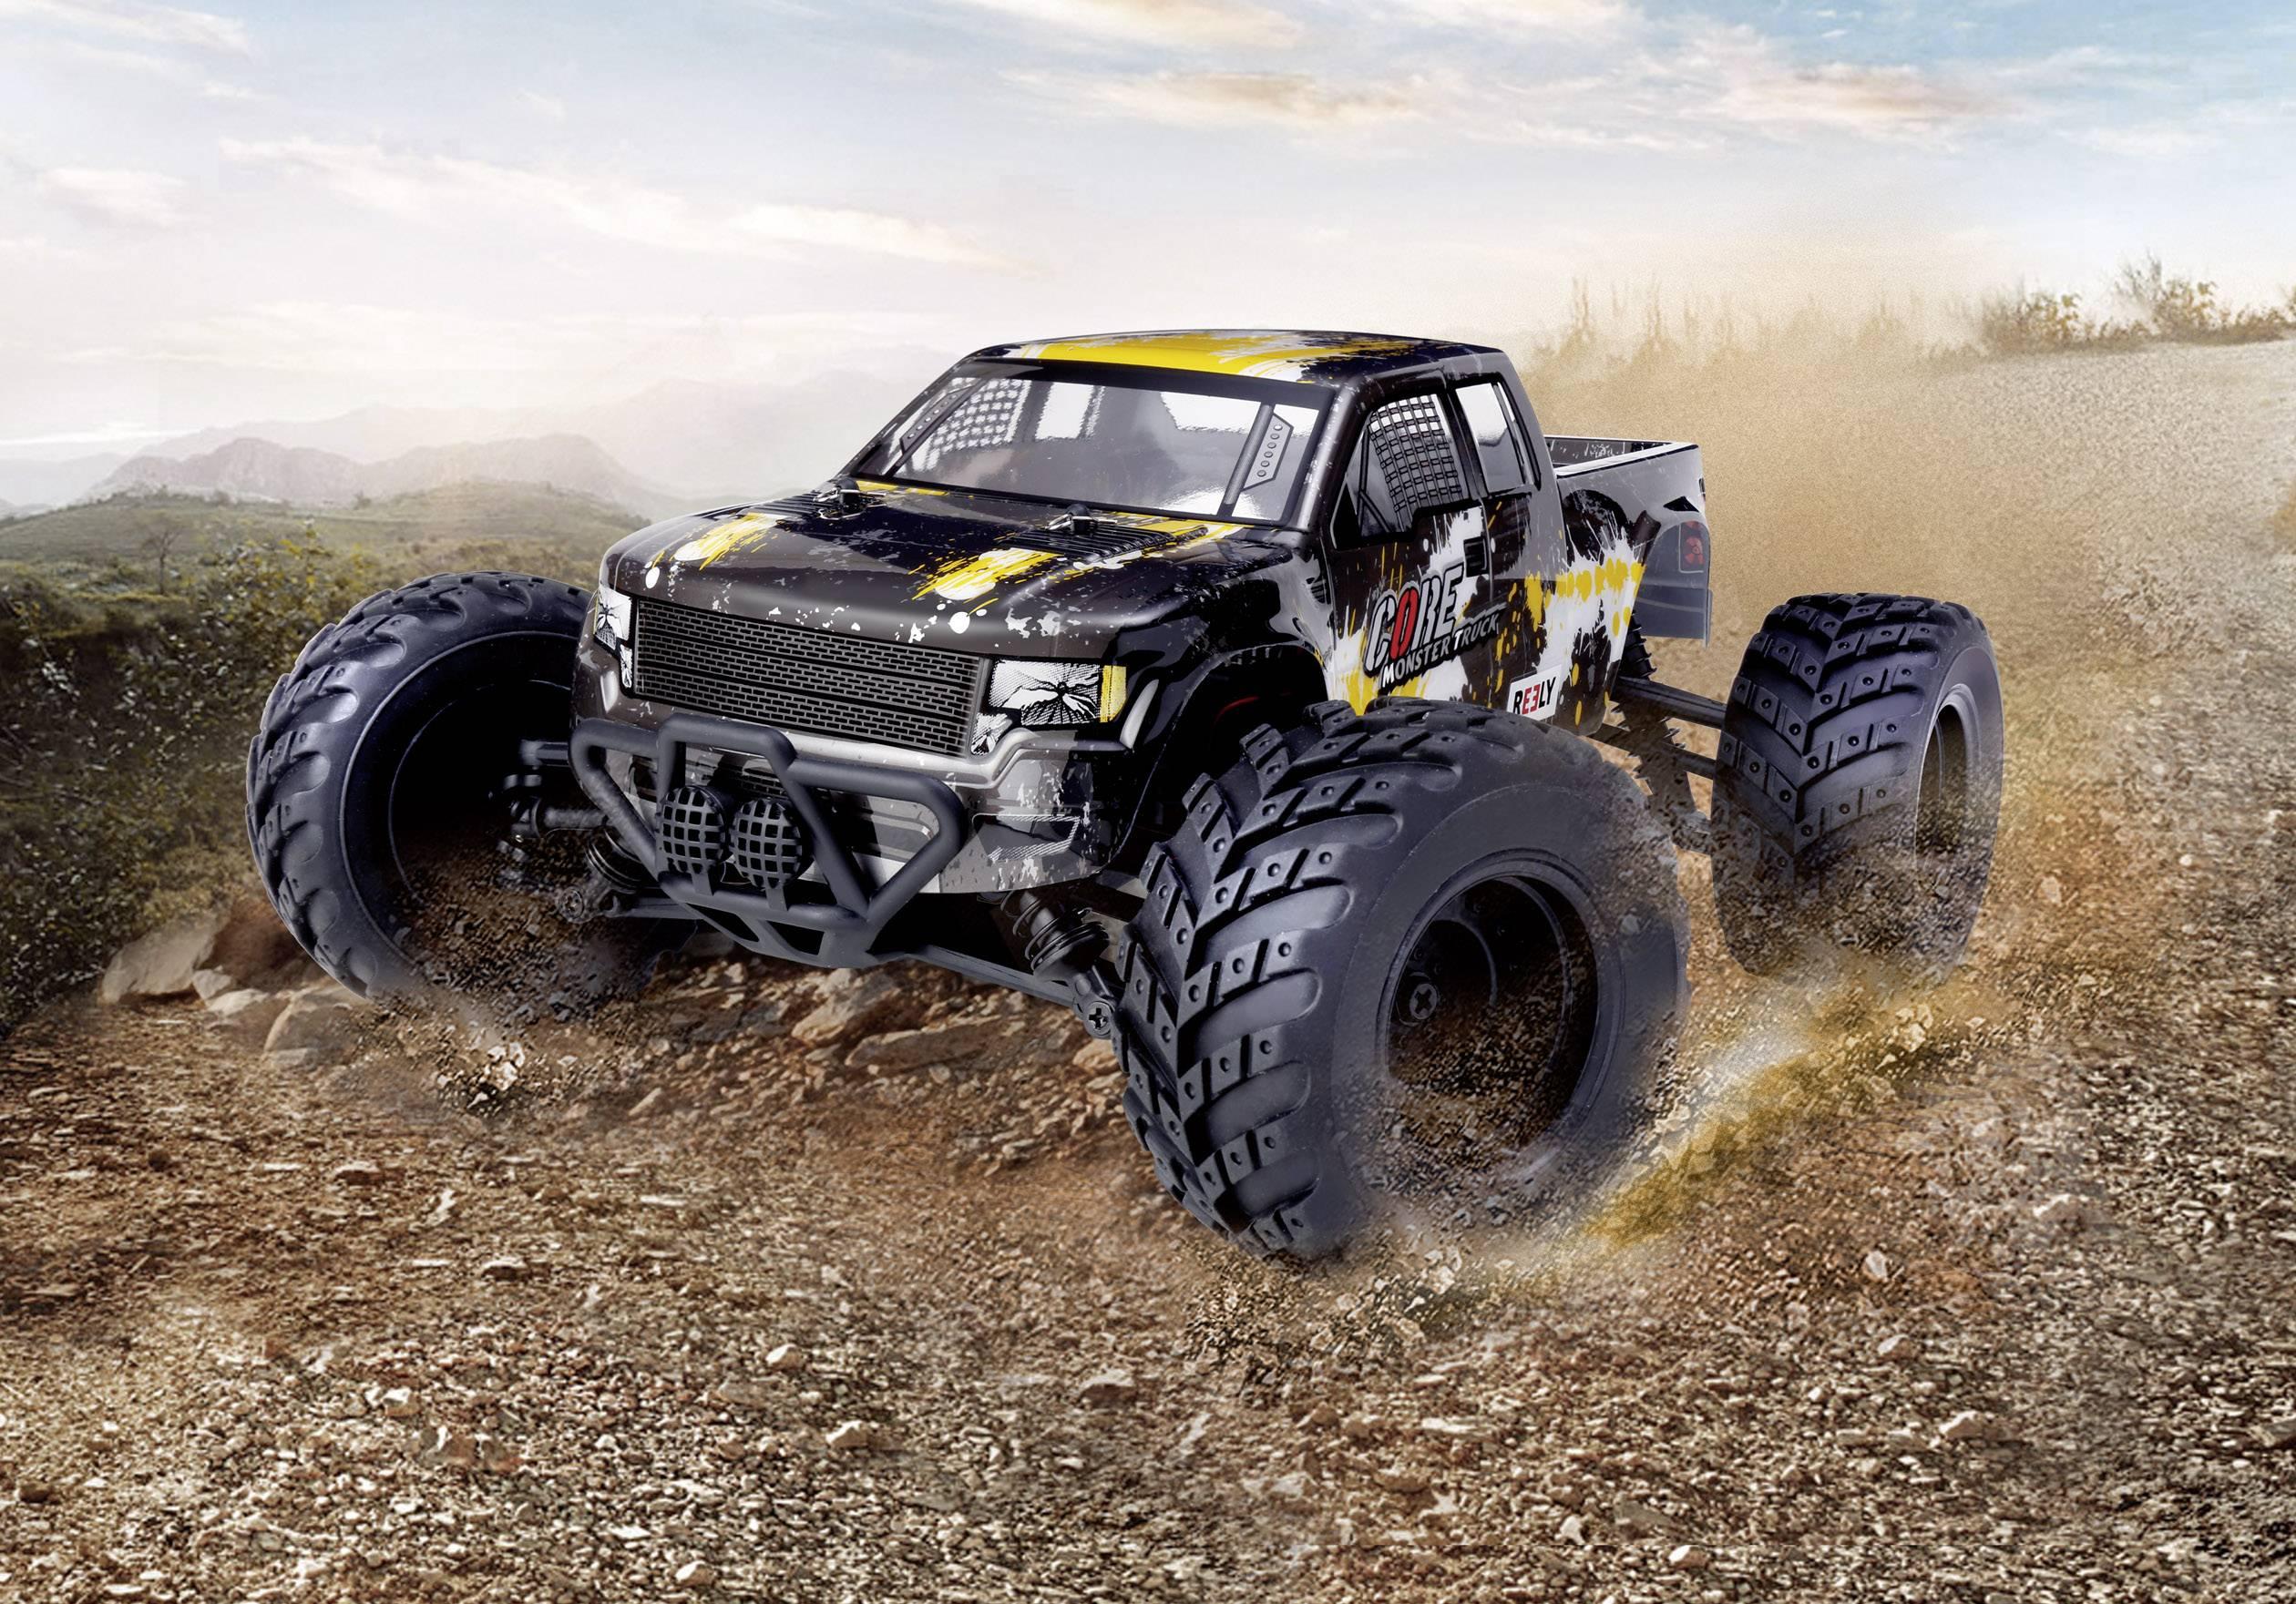 RC model auta monster truck Reely Core, komutátorový, 1:10 XS, 4WD (4x4), RtR, 20 km/h